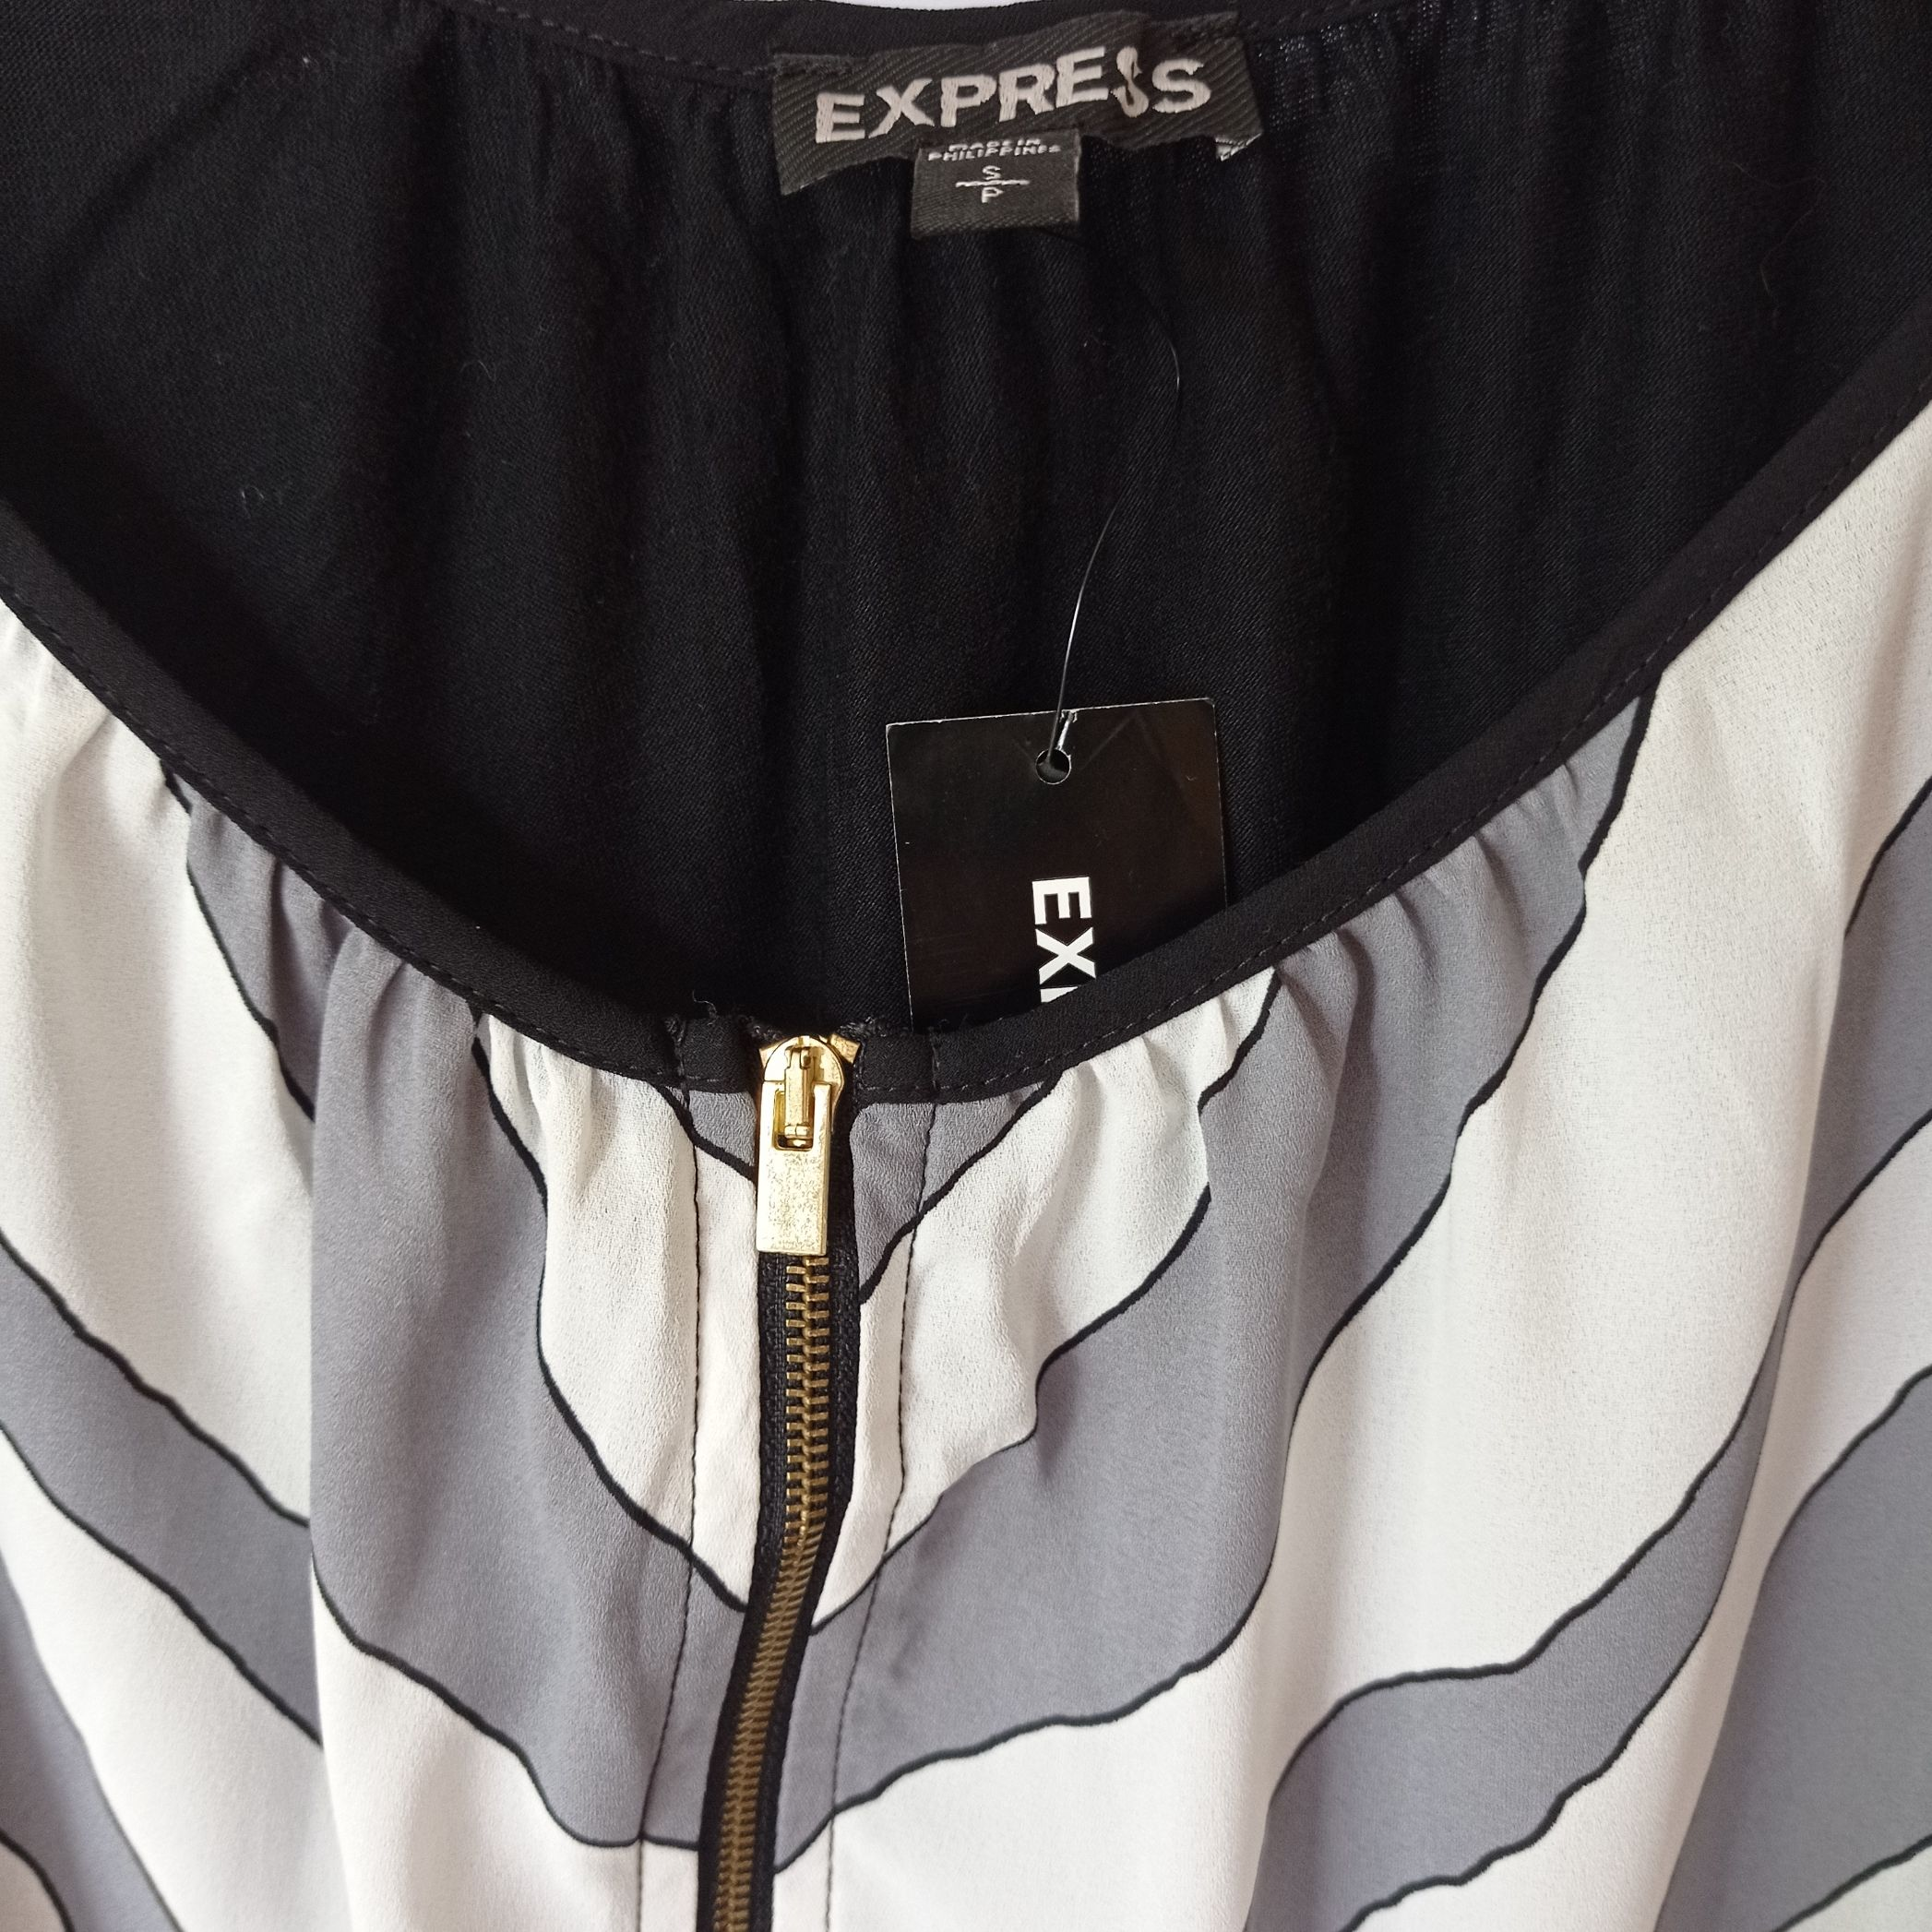 Express , talla S